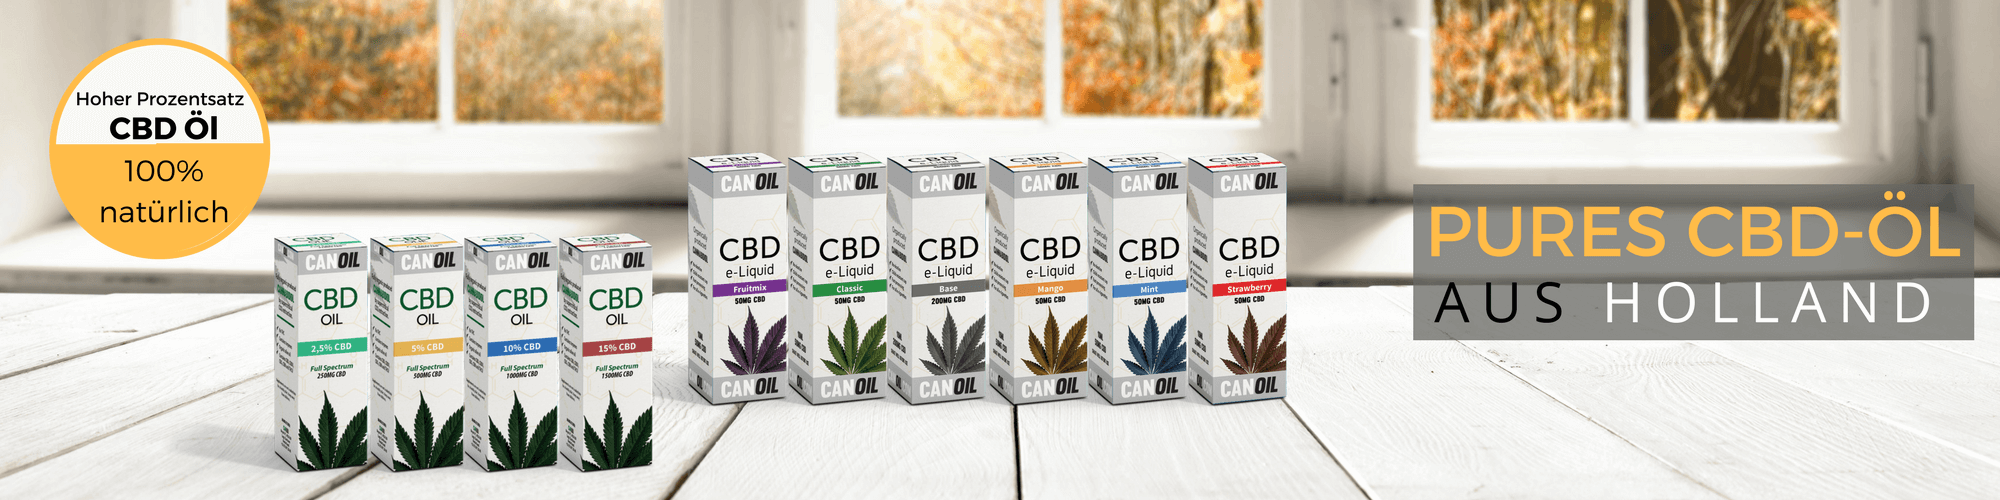 Produzent CBD ÖL und CBD Produkte | Canoil CBD Öl kaufen banner 2